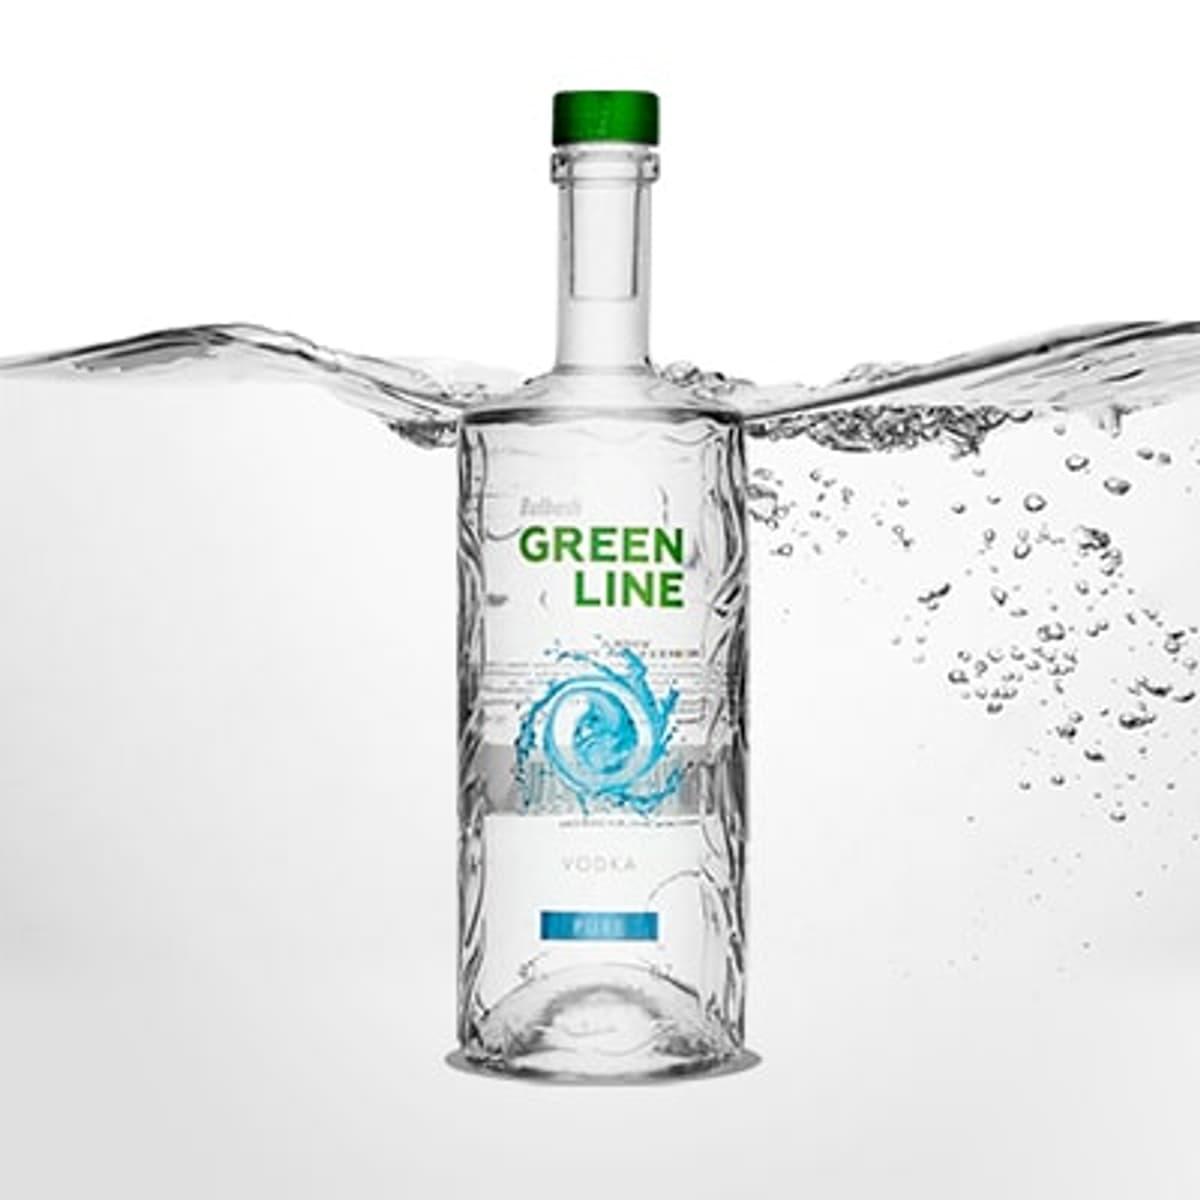 Bulbash Greenline Pure Vodka